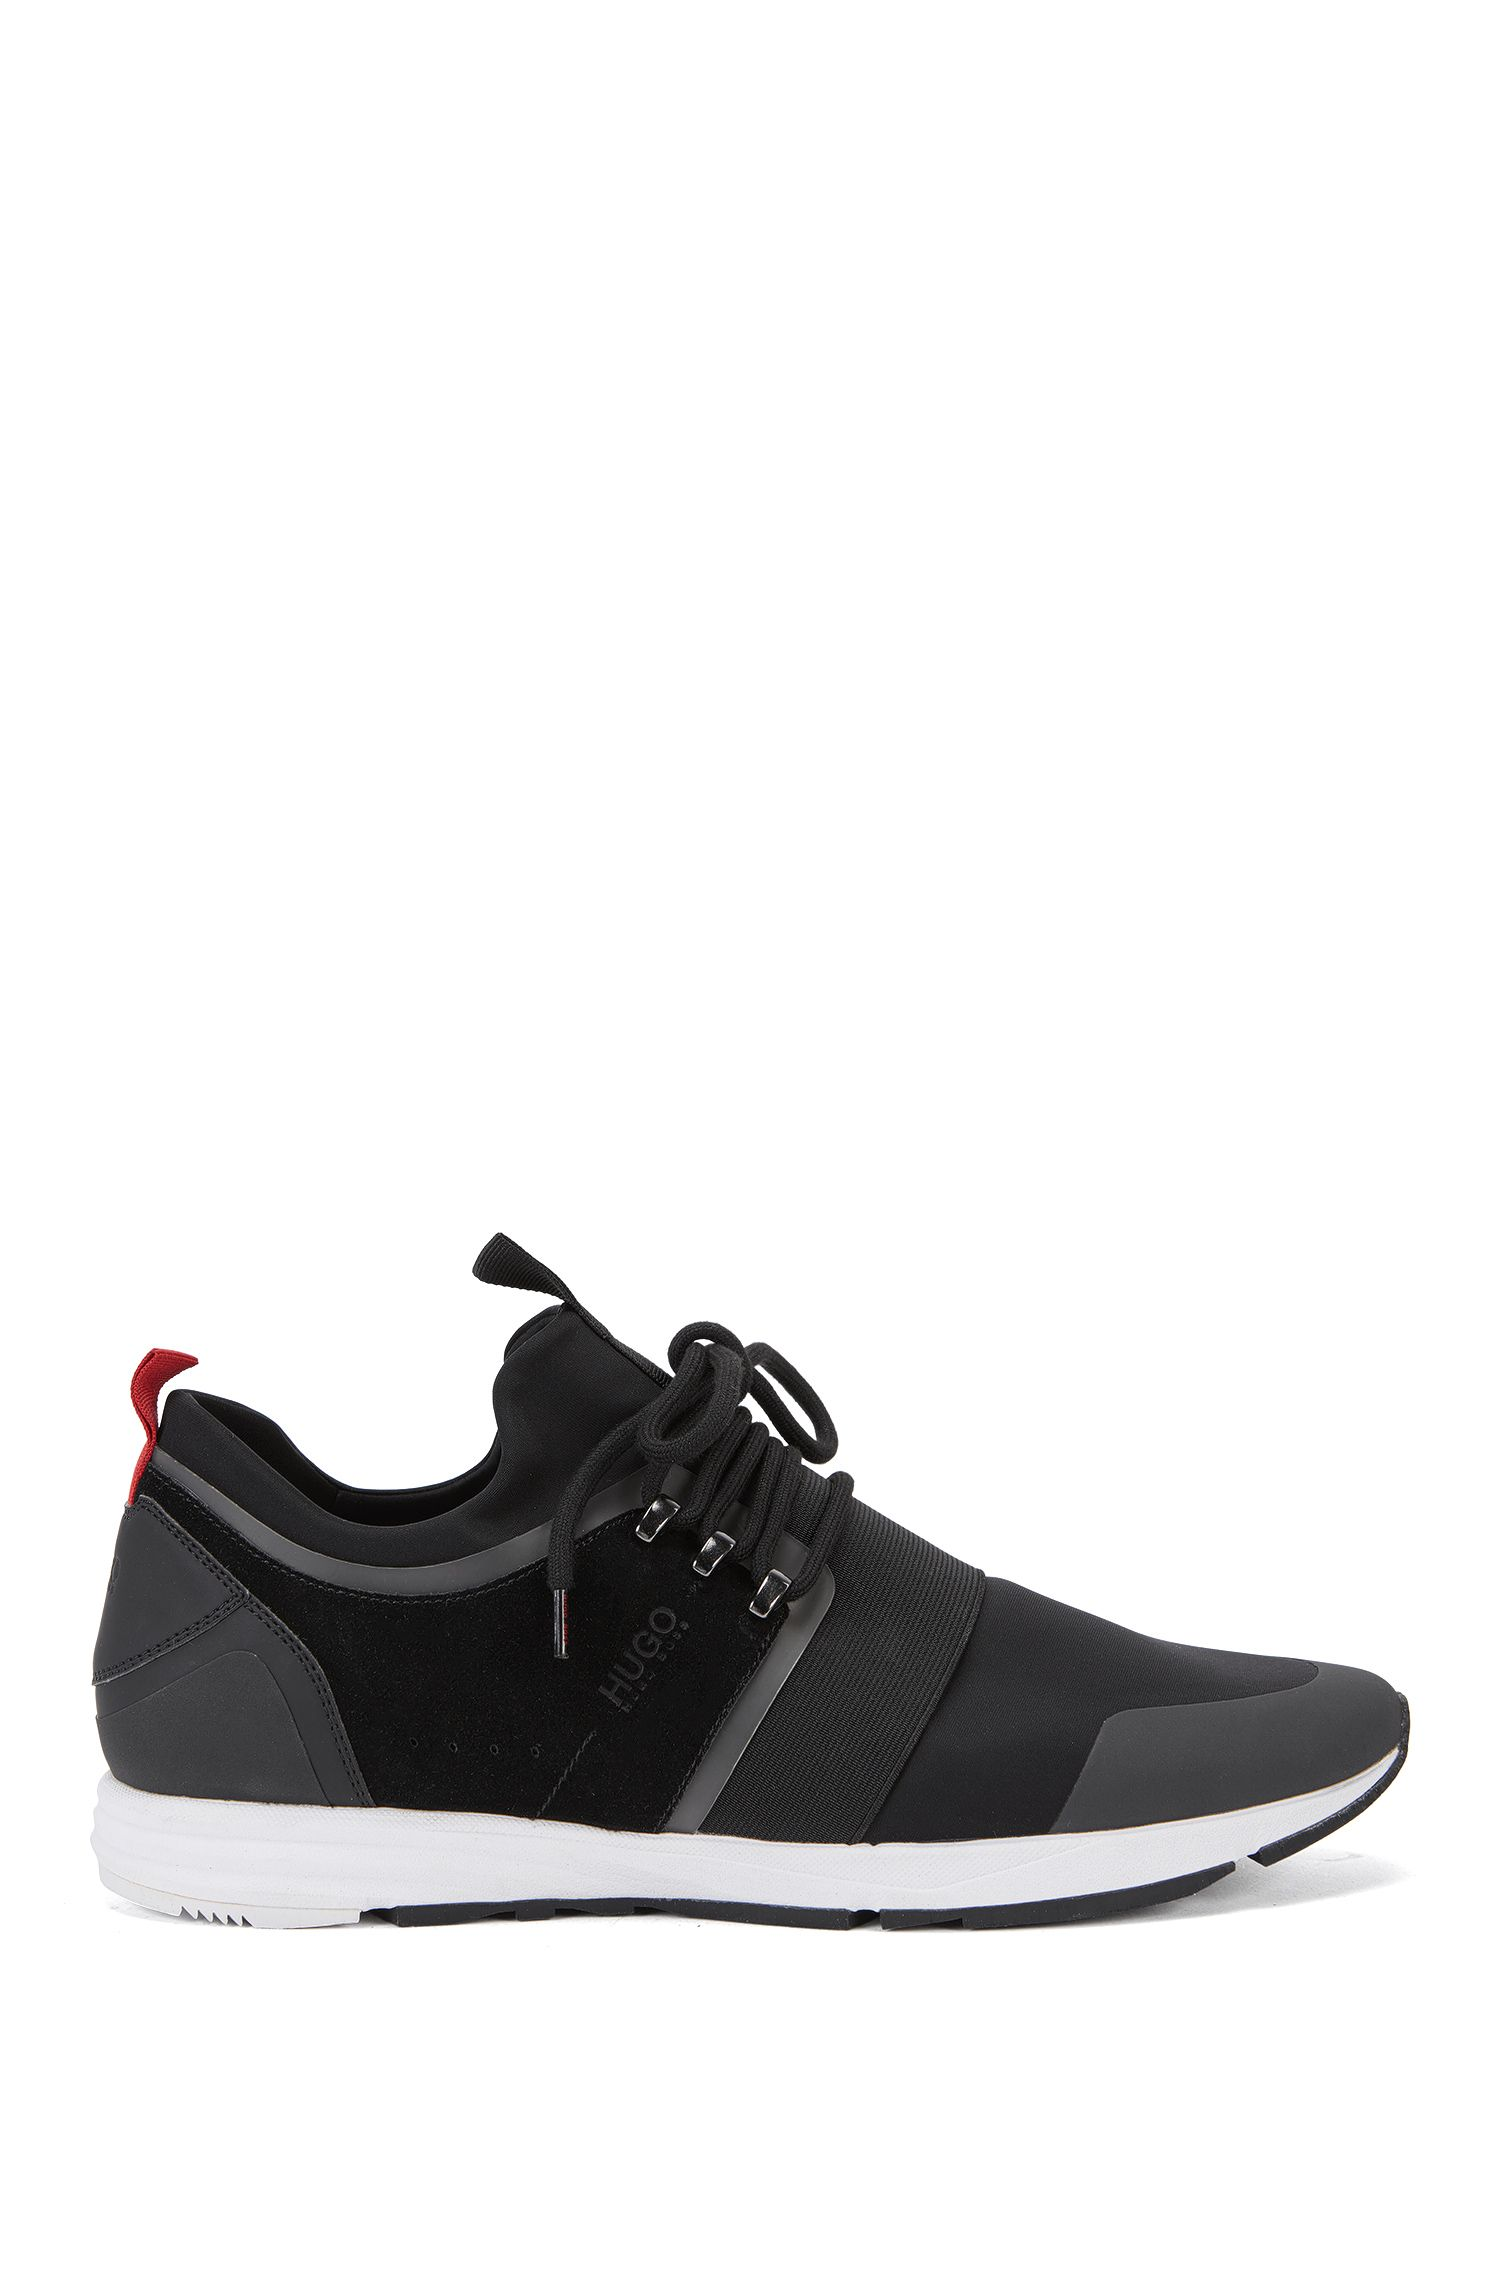 Sneakers met Vibram-zool en elastisch banddetail